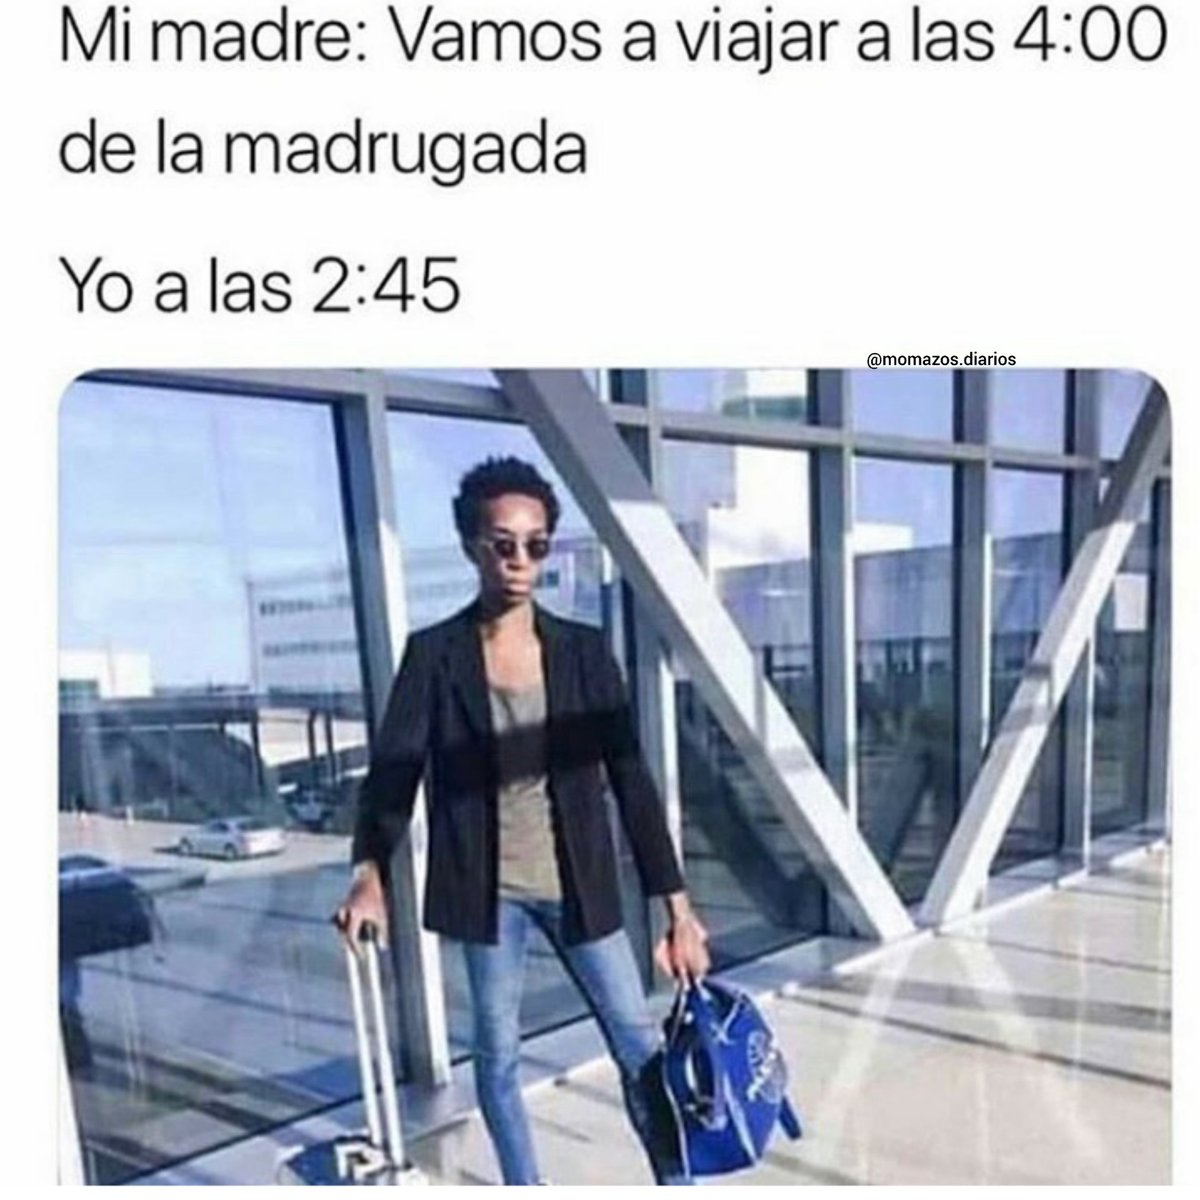 Jajajaja #memes #memesenespañol #memesespañol #momazos #momazo #momo #momos #memes #meme #humor #chistes #gracioso #chistepic.twitter.com/WE77mkw6jO